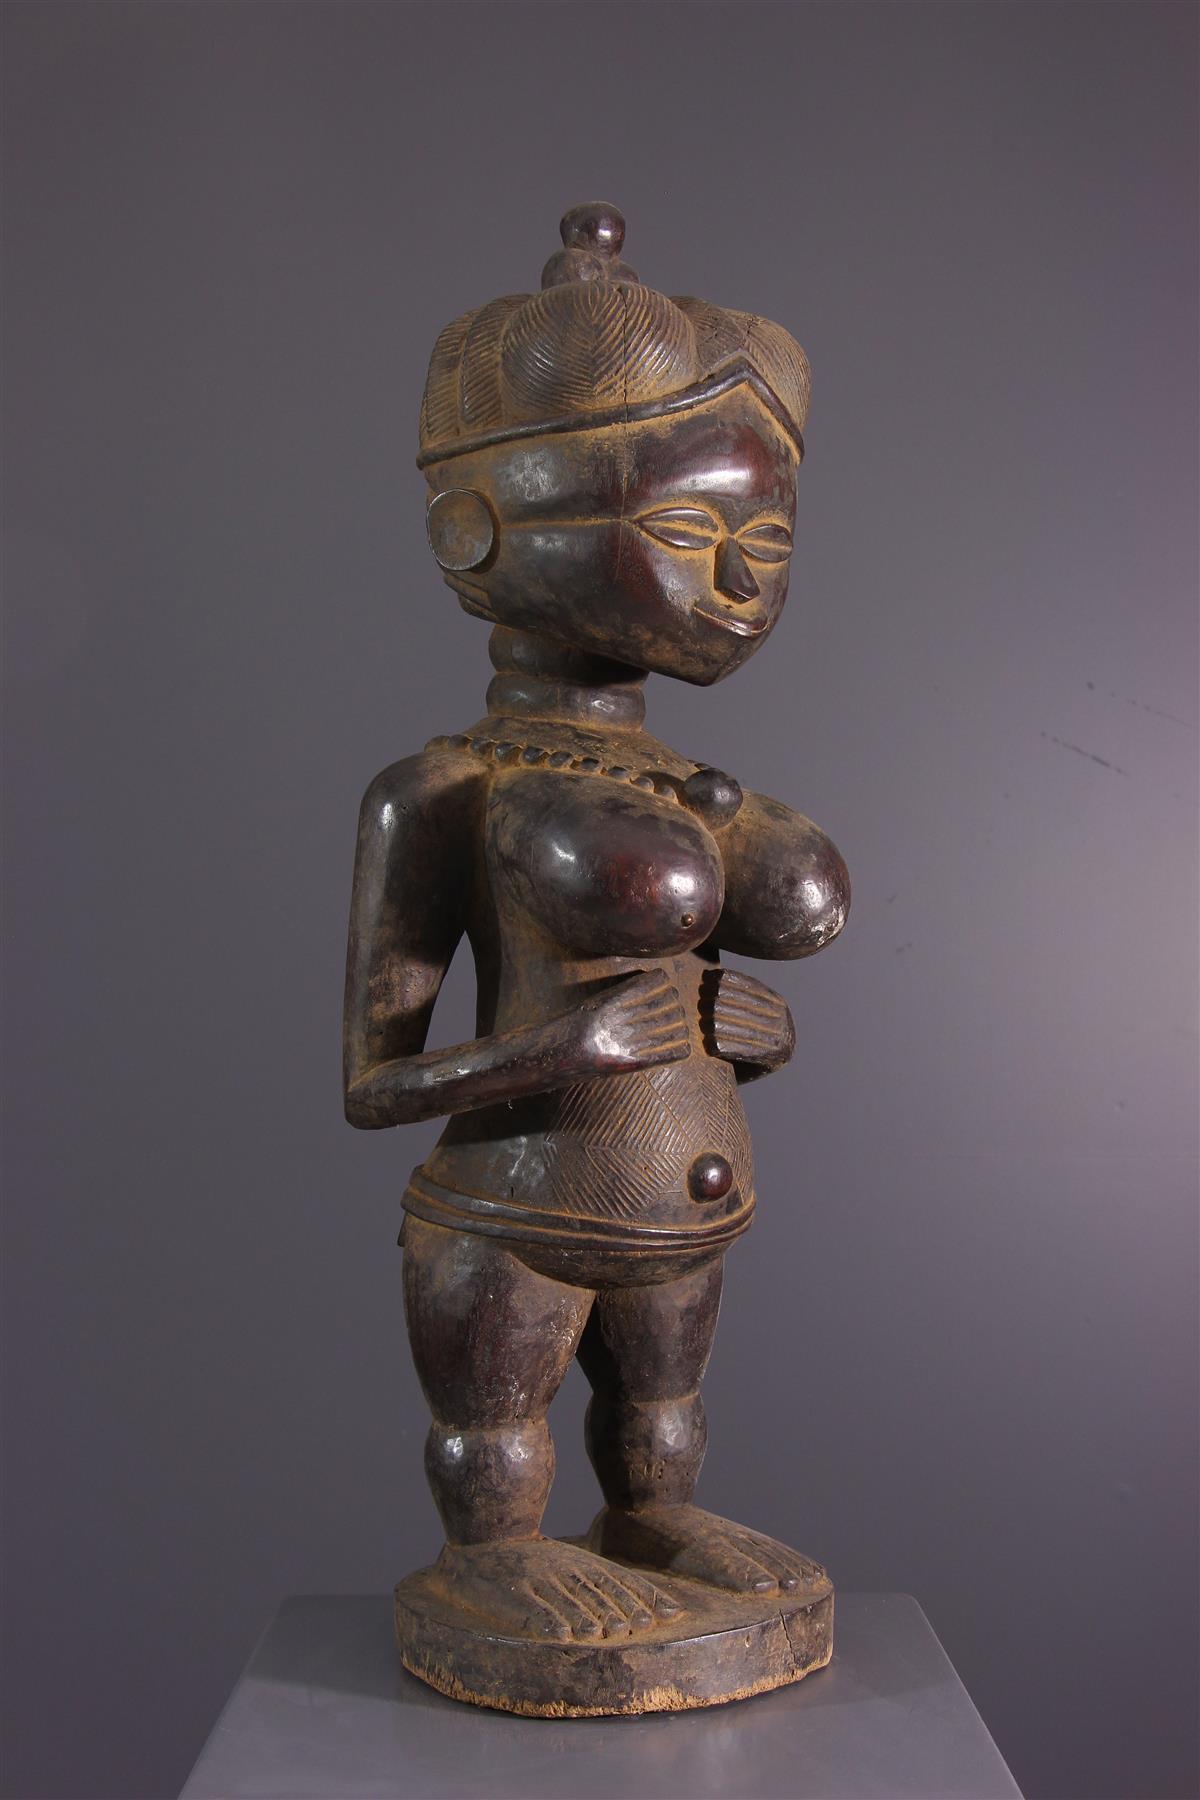 Statue Temne - Art africain